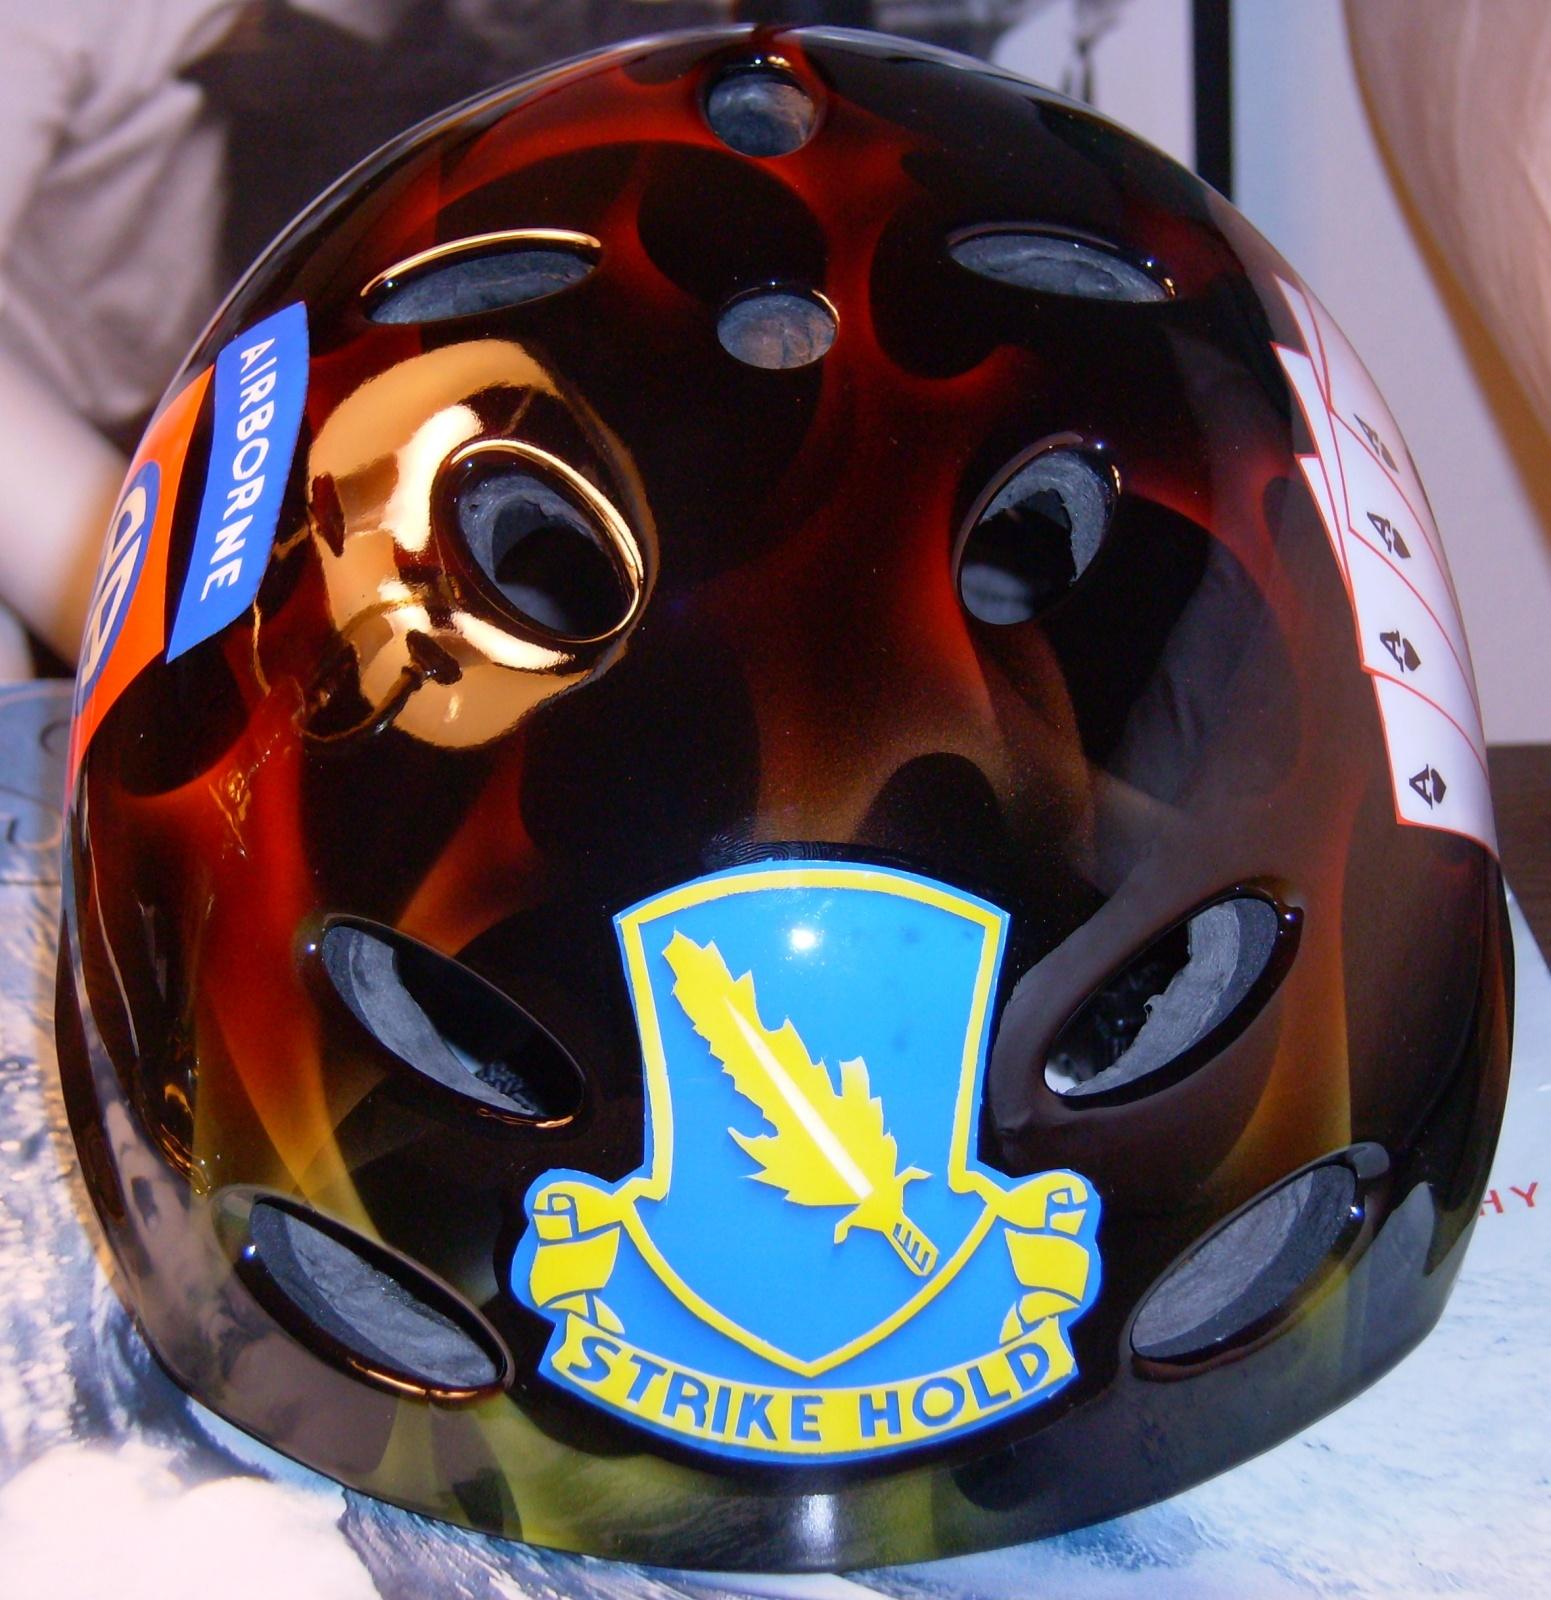 Click image for larger version  Name:Custom kayak helmet 015.jpg Views:297 Size:673.5 KB ID:848